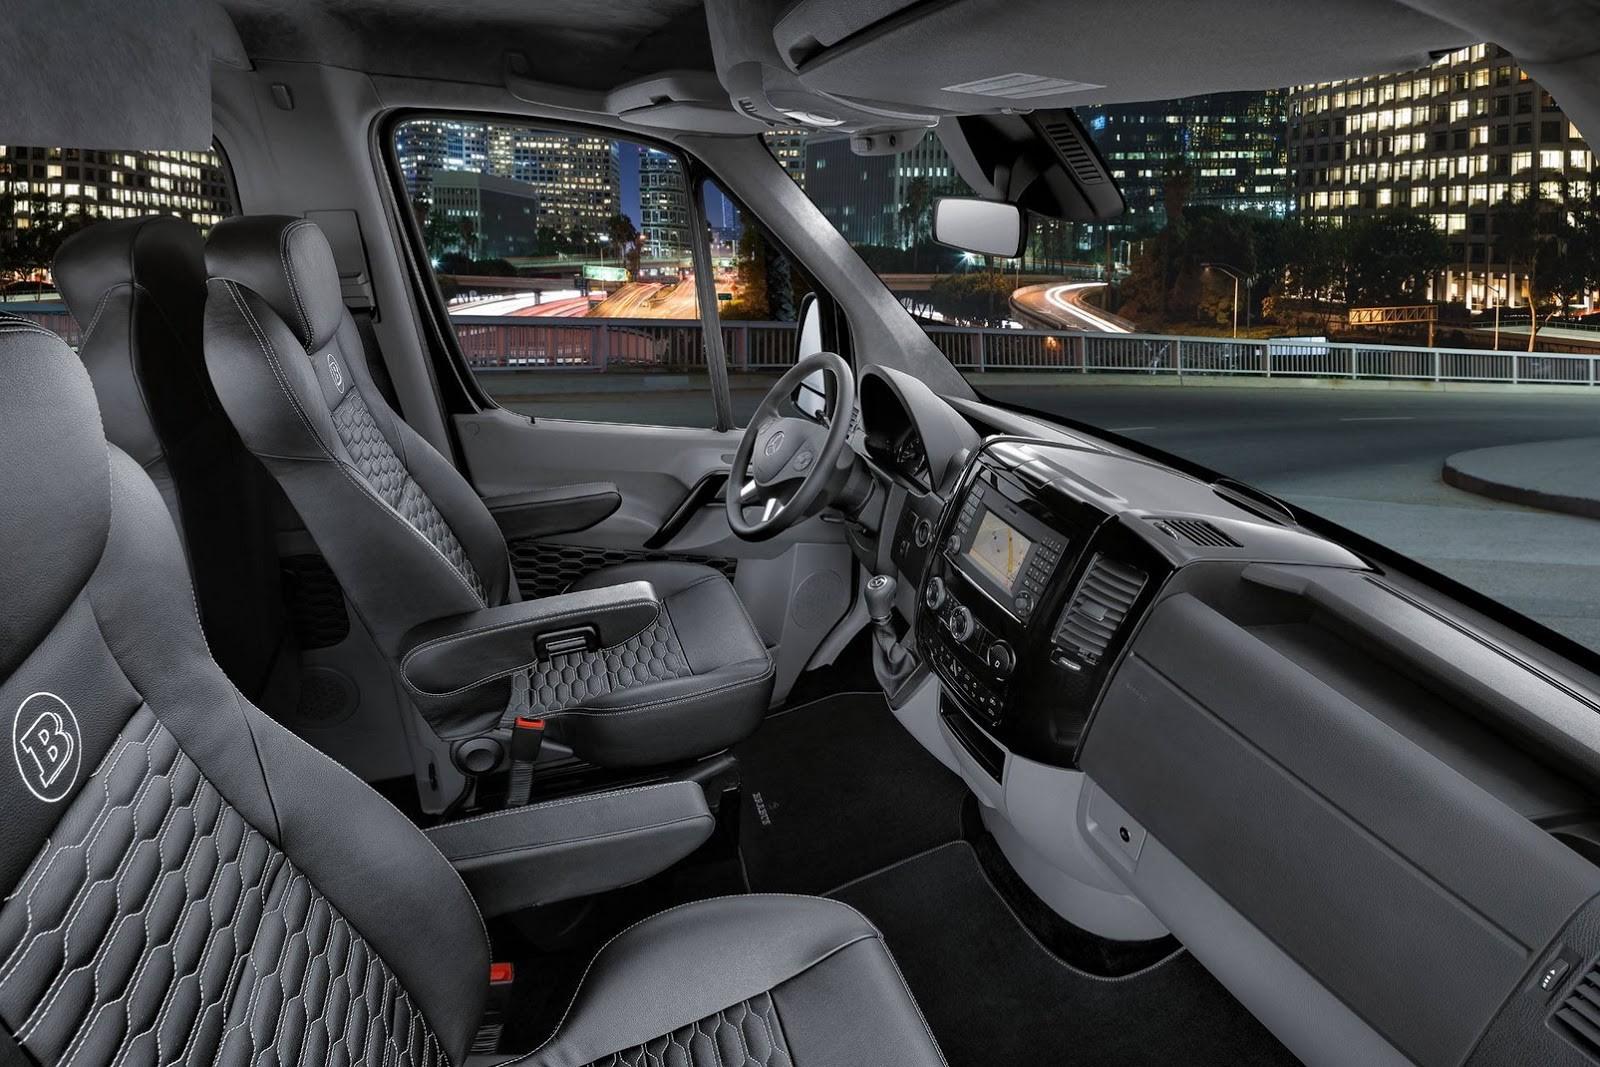 Brabus Mercedes-Benz Sprinter Conference Lounge